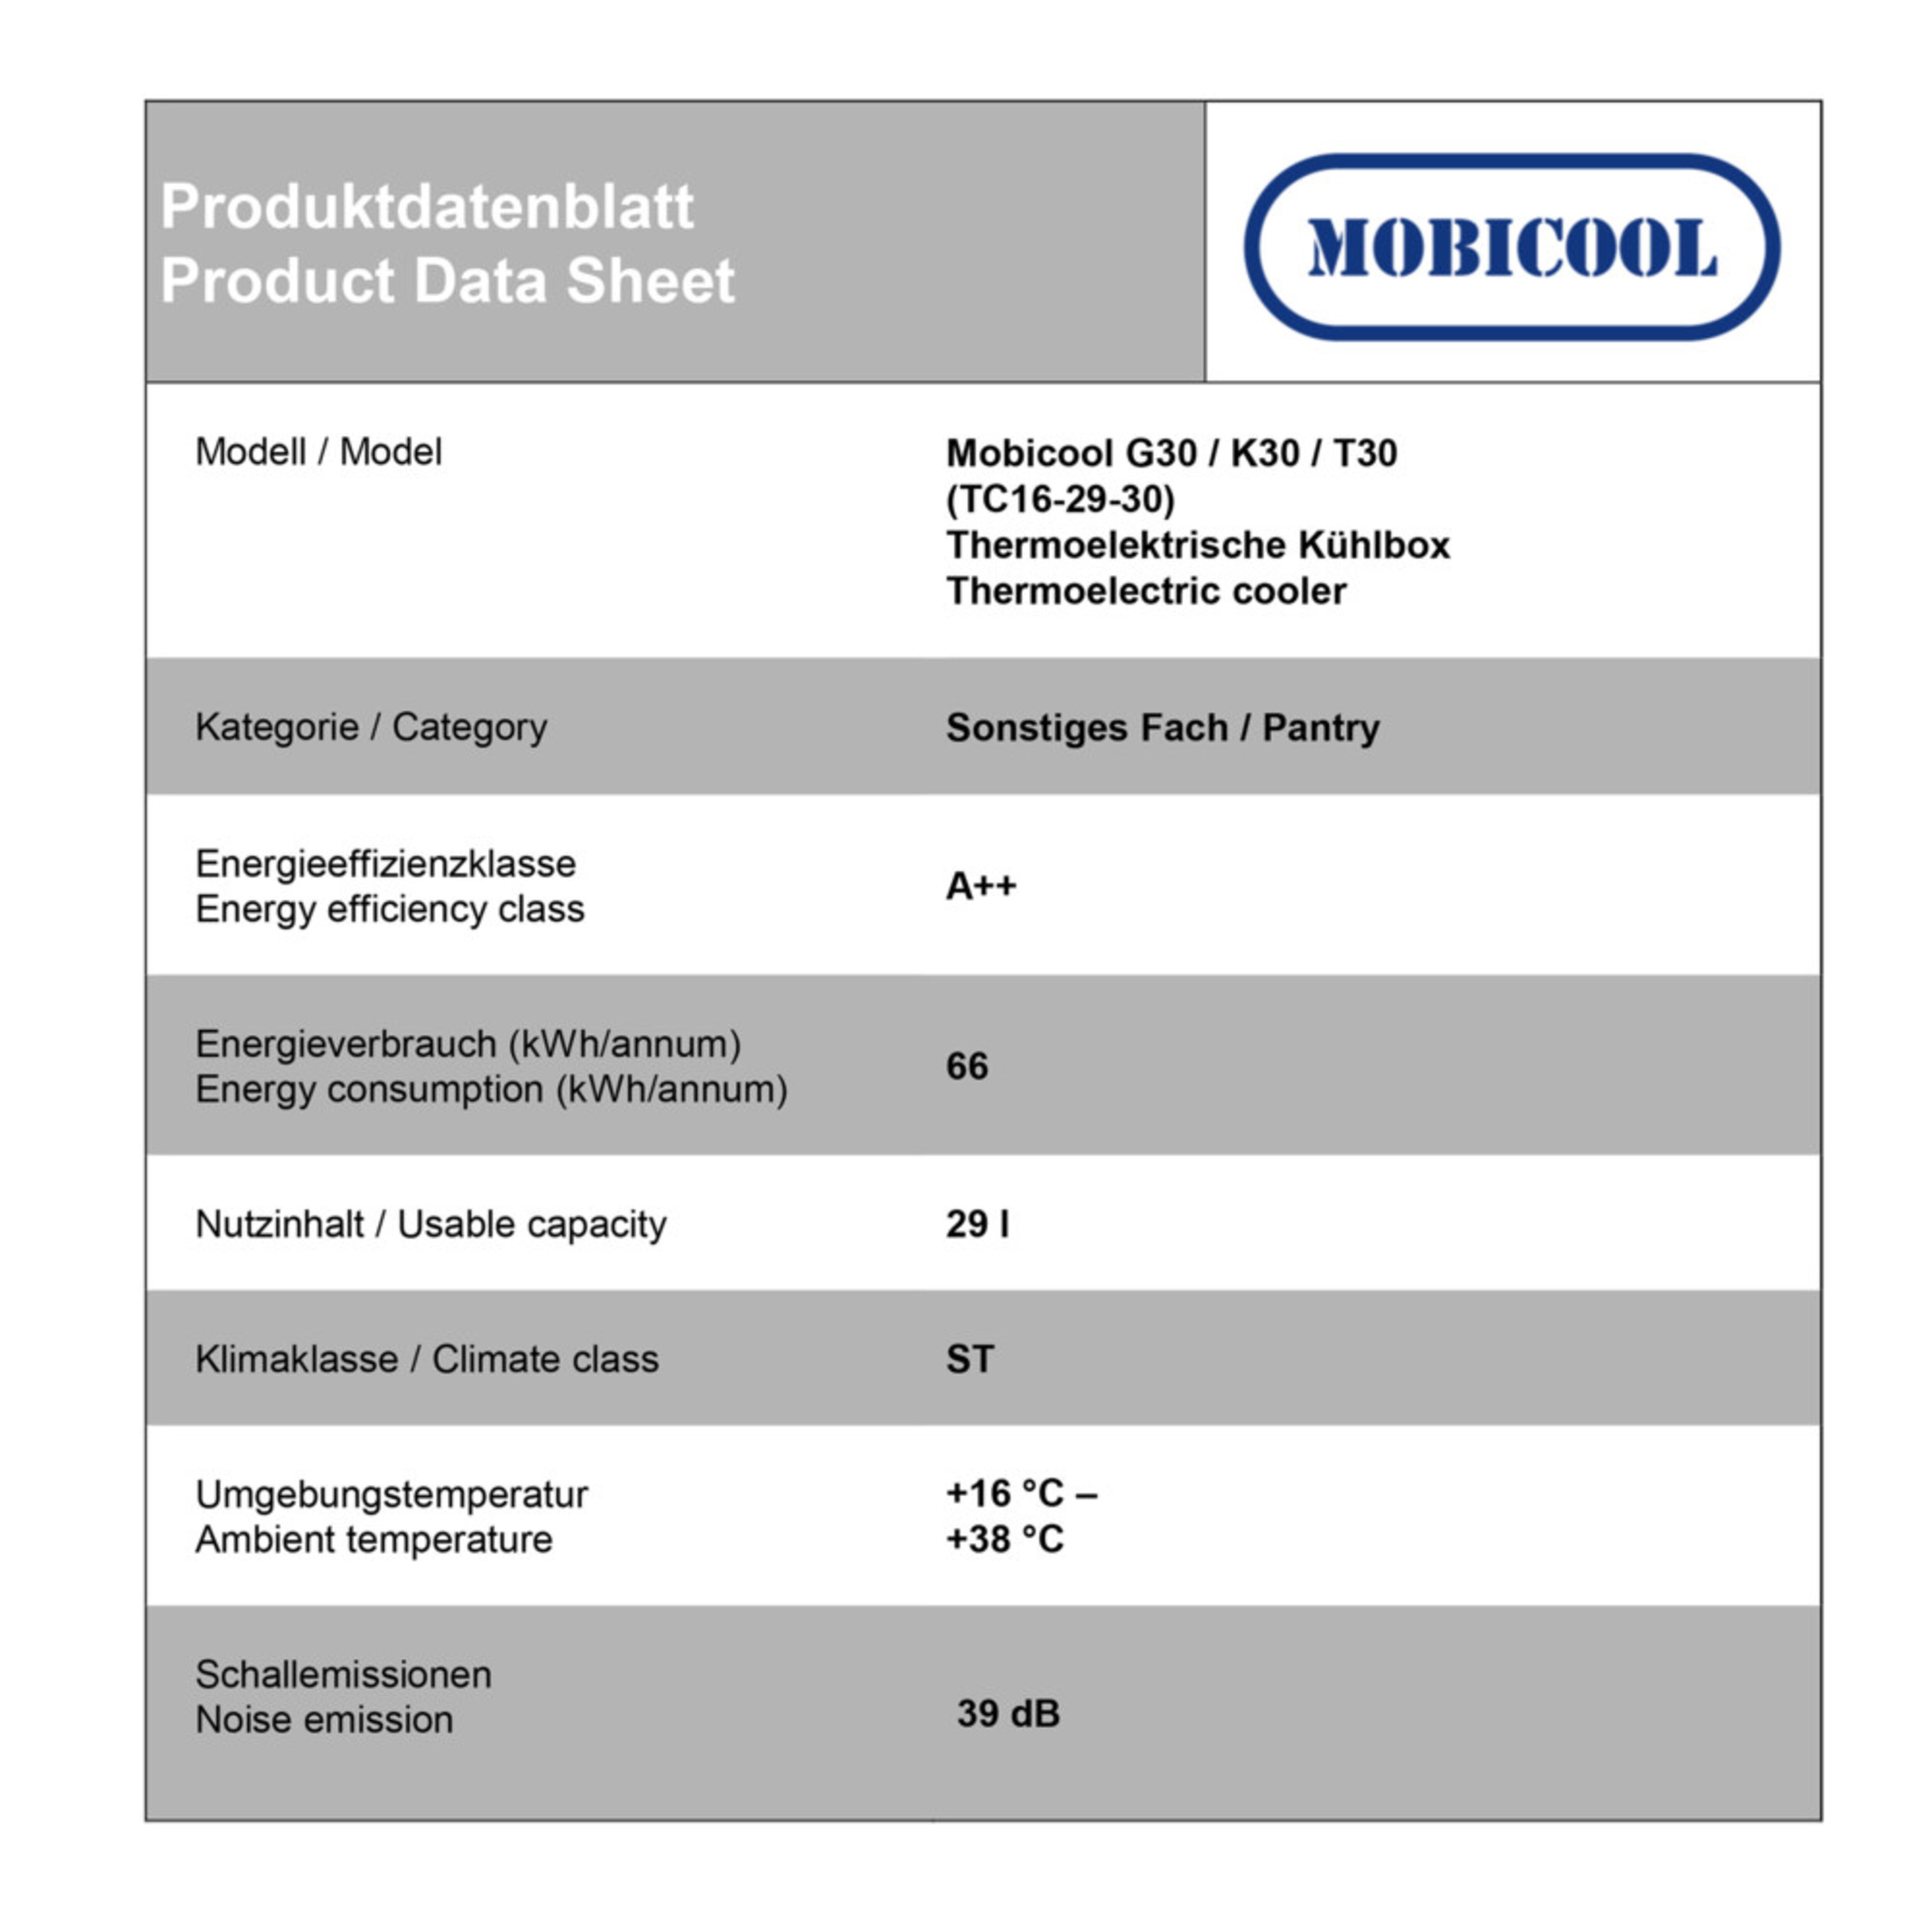 Mobicool G30 AC/DC Energy data sheet